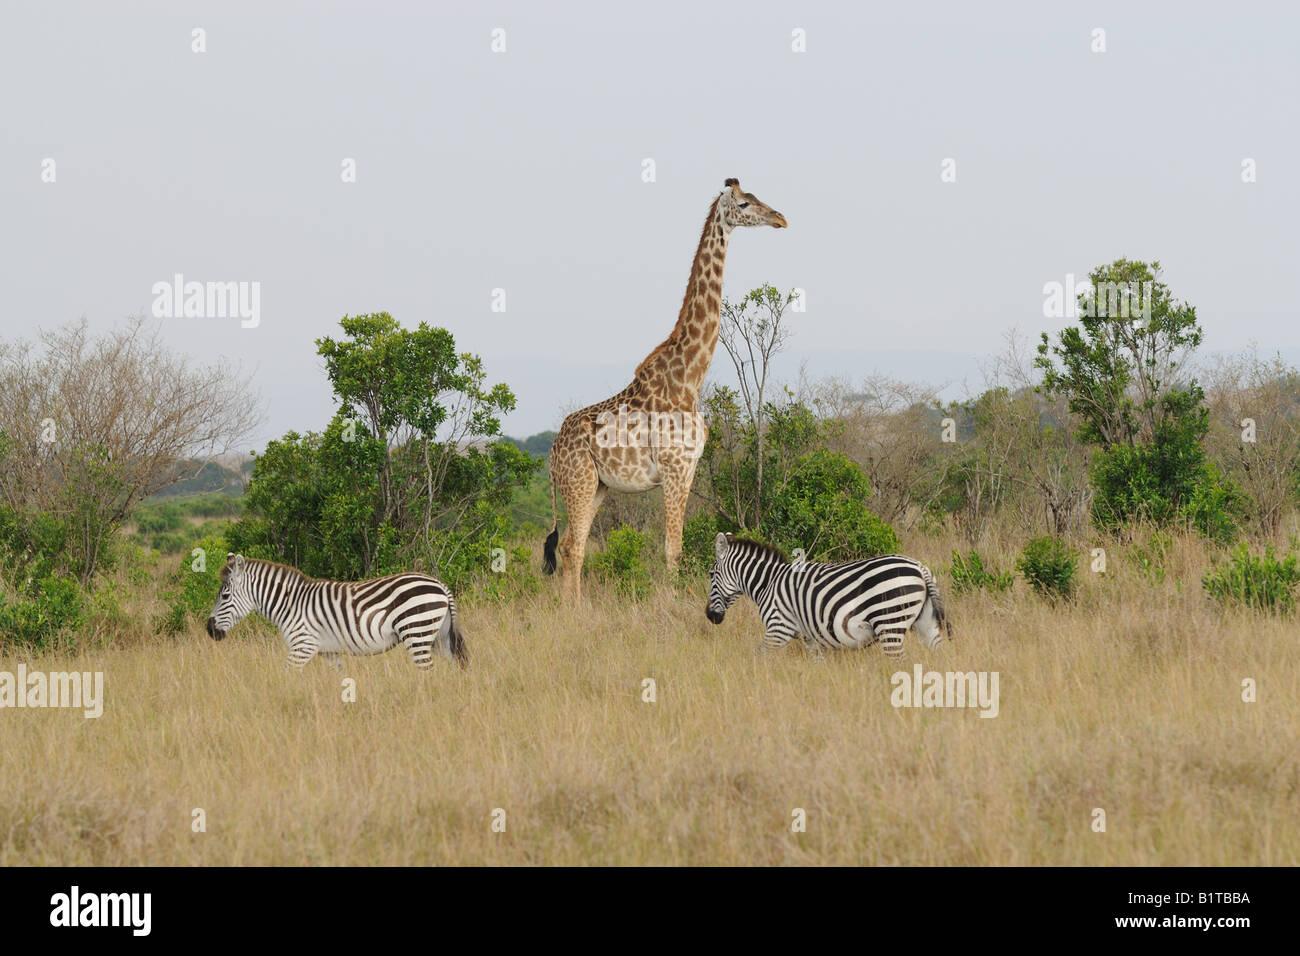 Masai giraffe and common zebras, Masai Mara Stock Photo